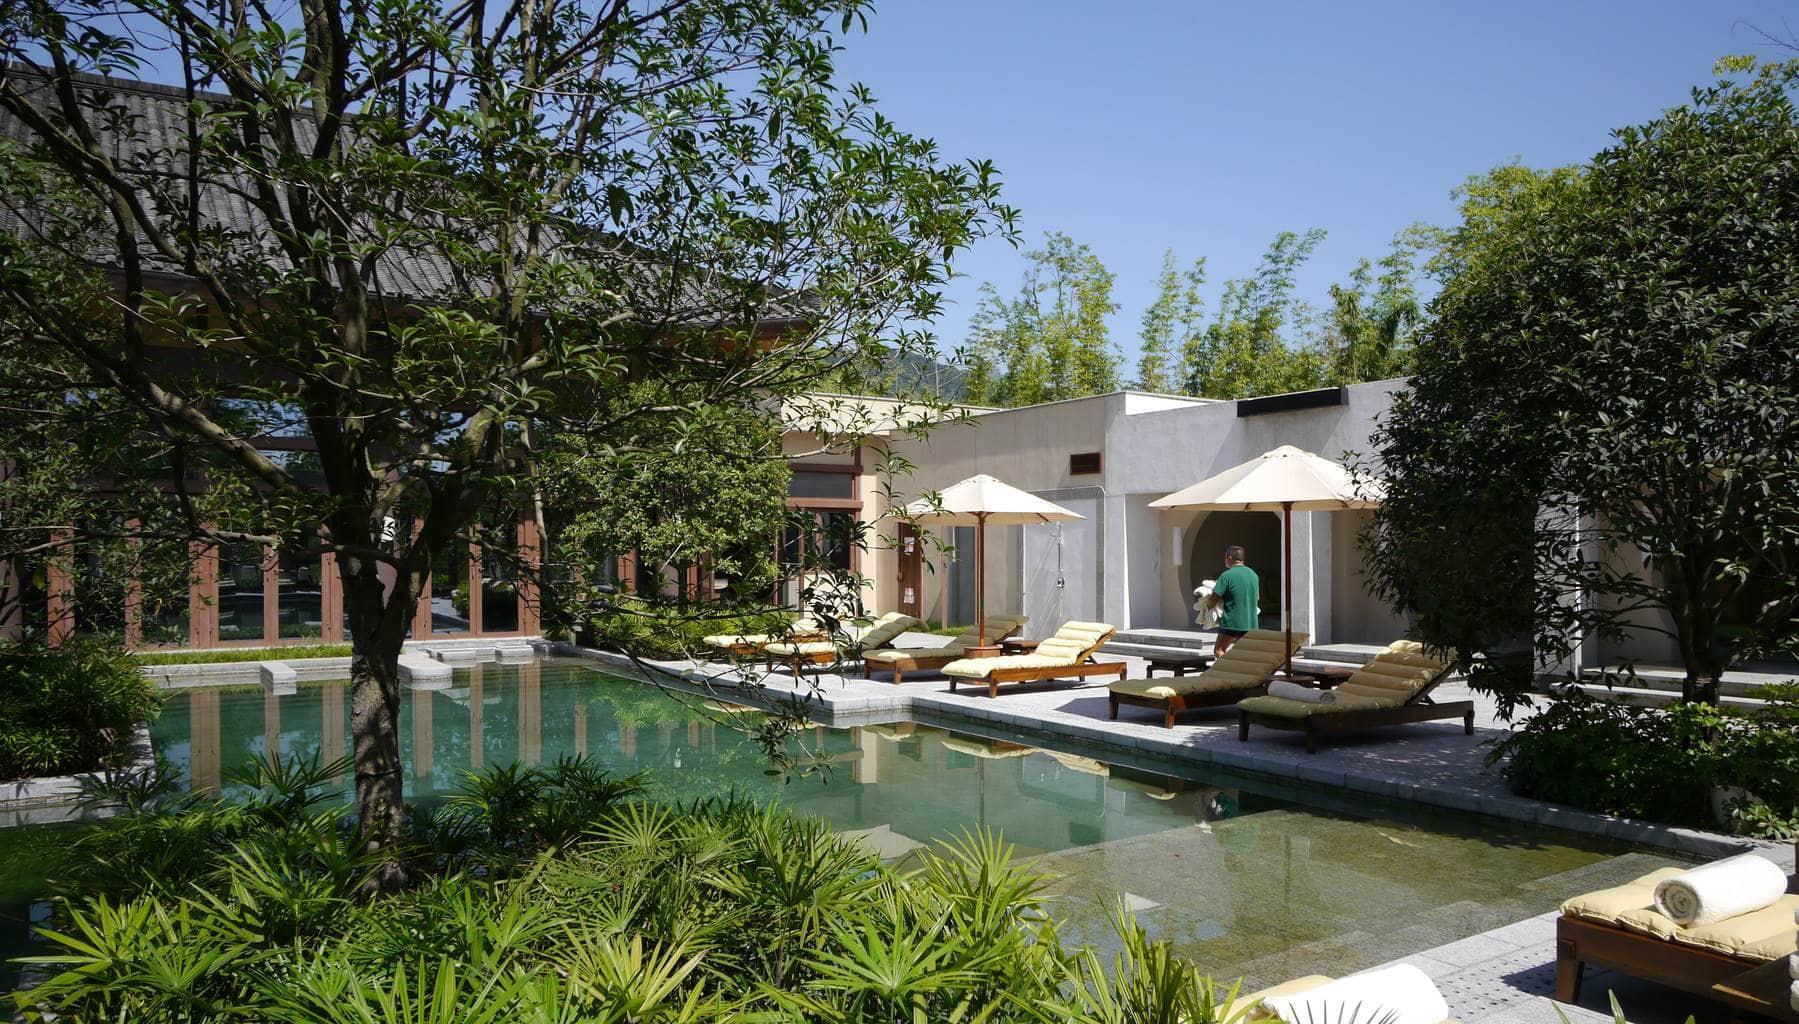 Outdoor swimming pool at Six Senses Qing Cheng Mountain